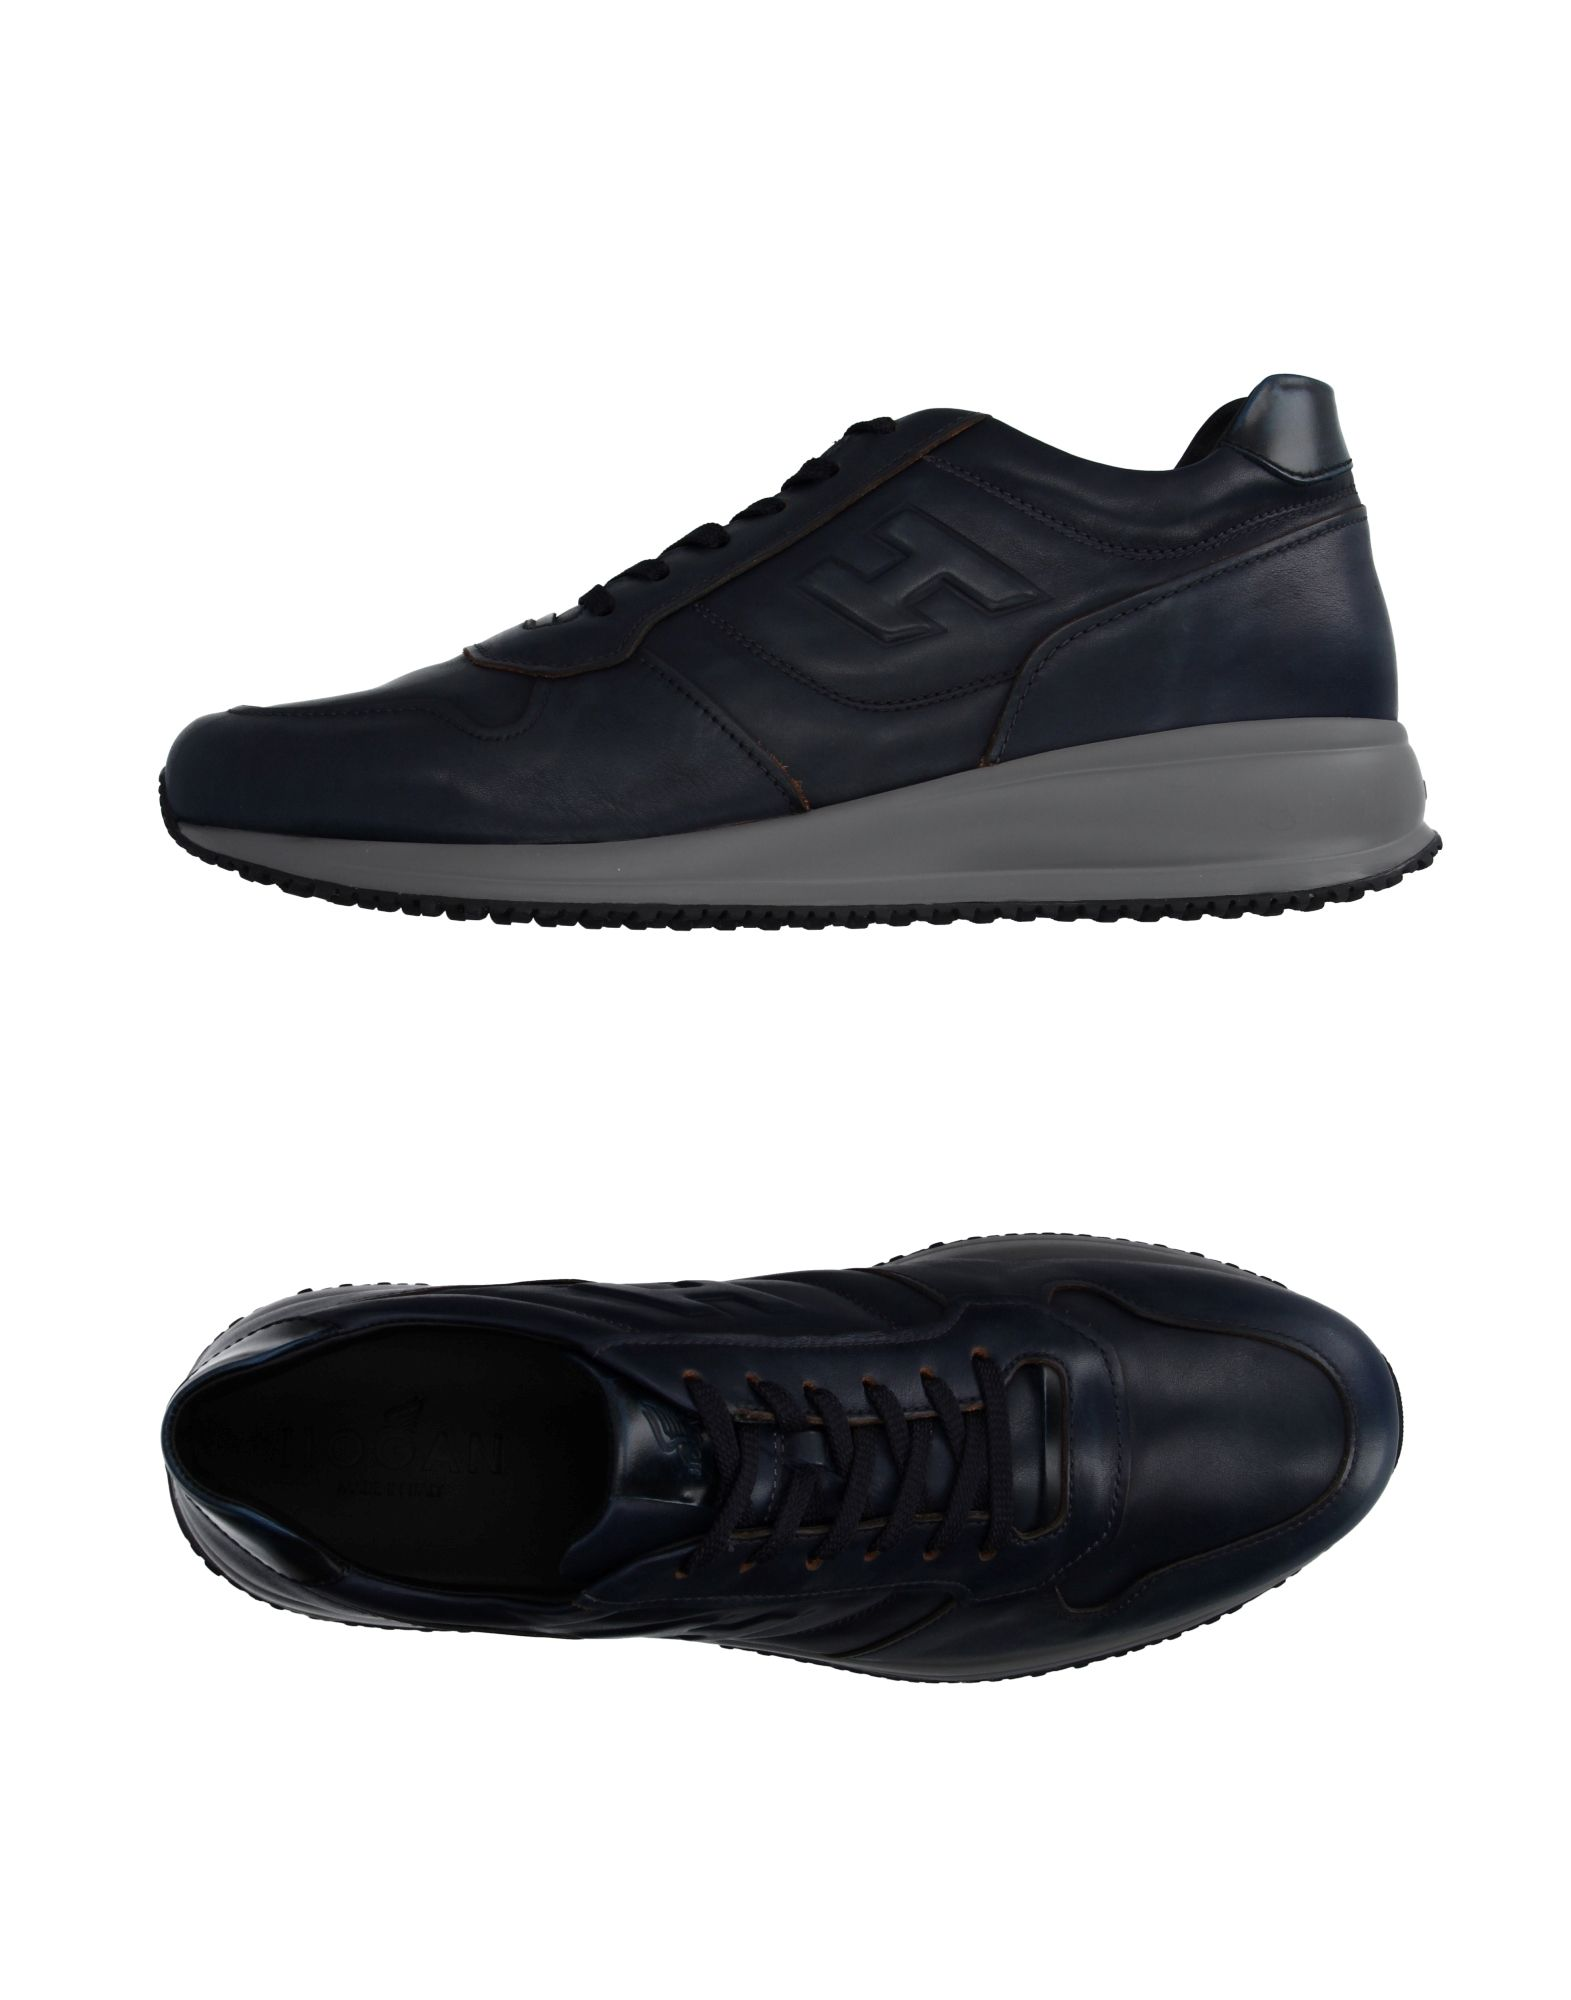 Hogan Sneakers Herren  11065453JS Gute Qualität beliebte Schuhe